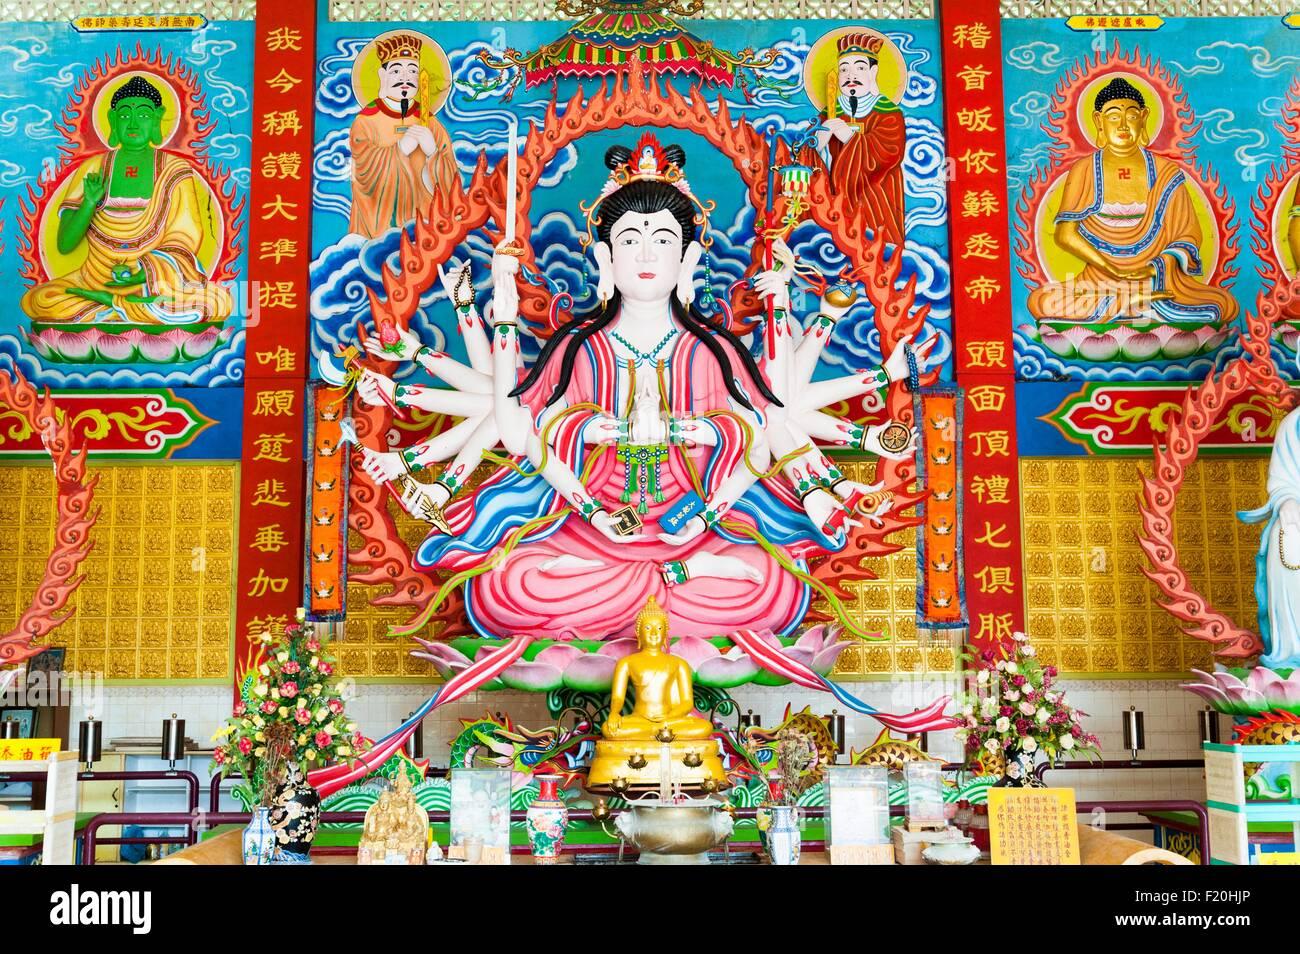 Malay buddhist